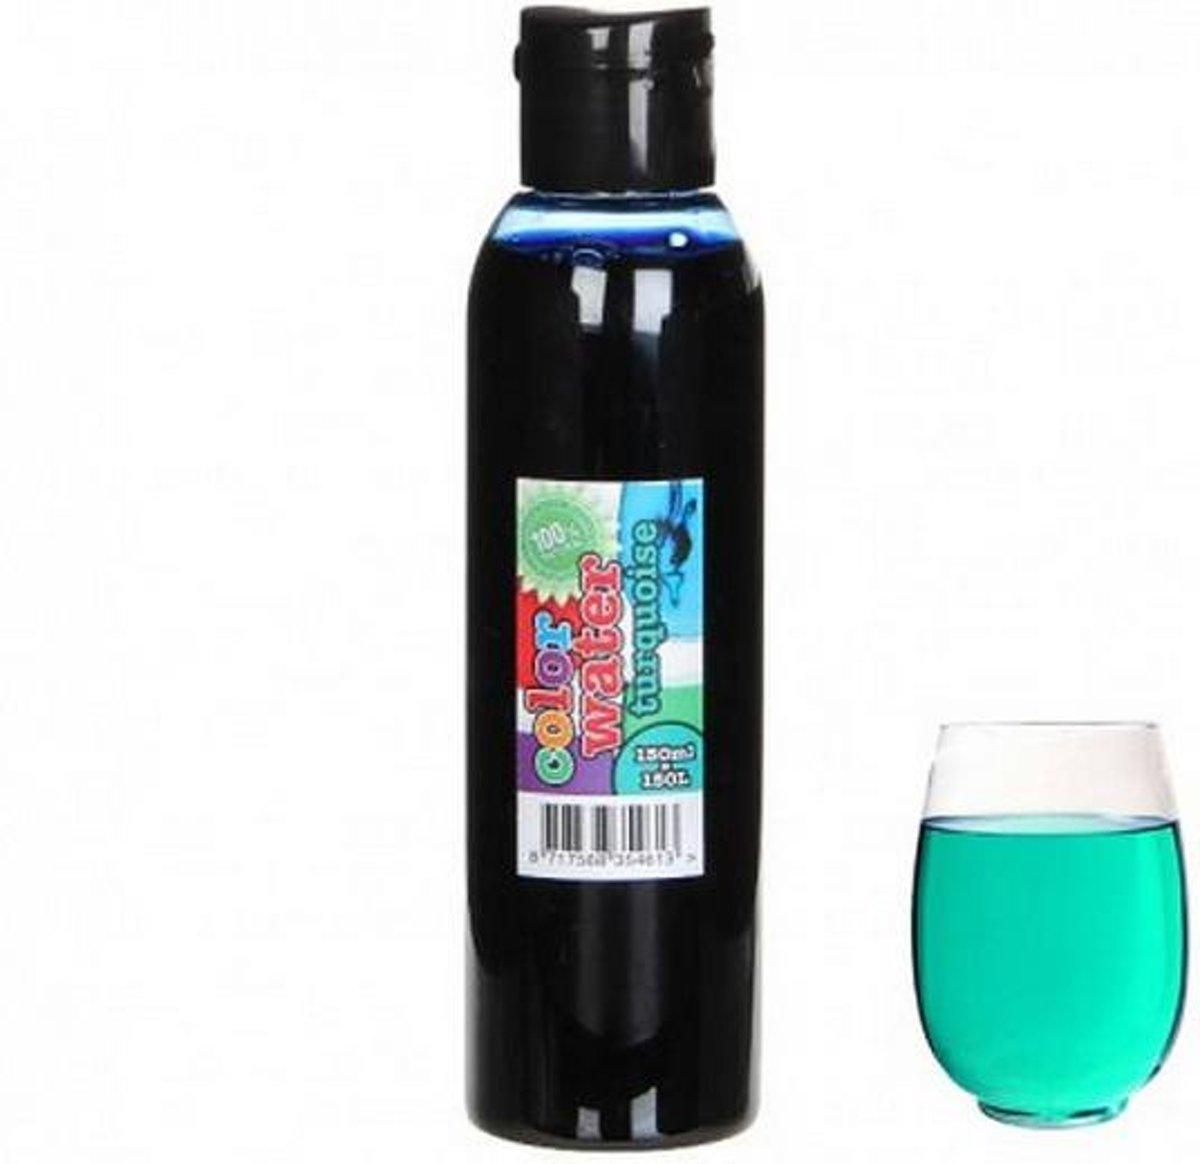 Kleurstof 150 ml - turquoise kopen